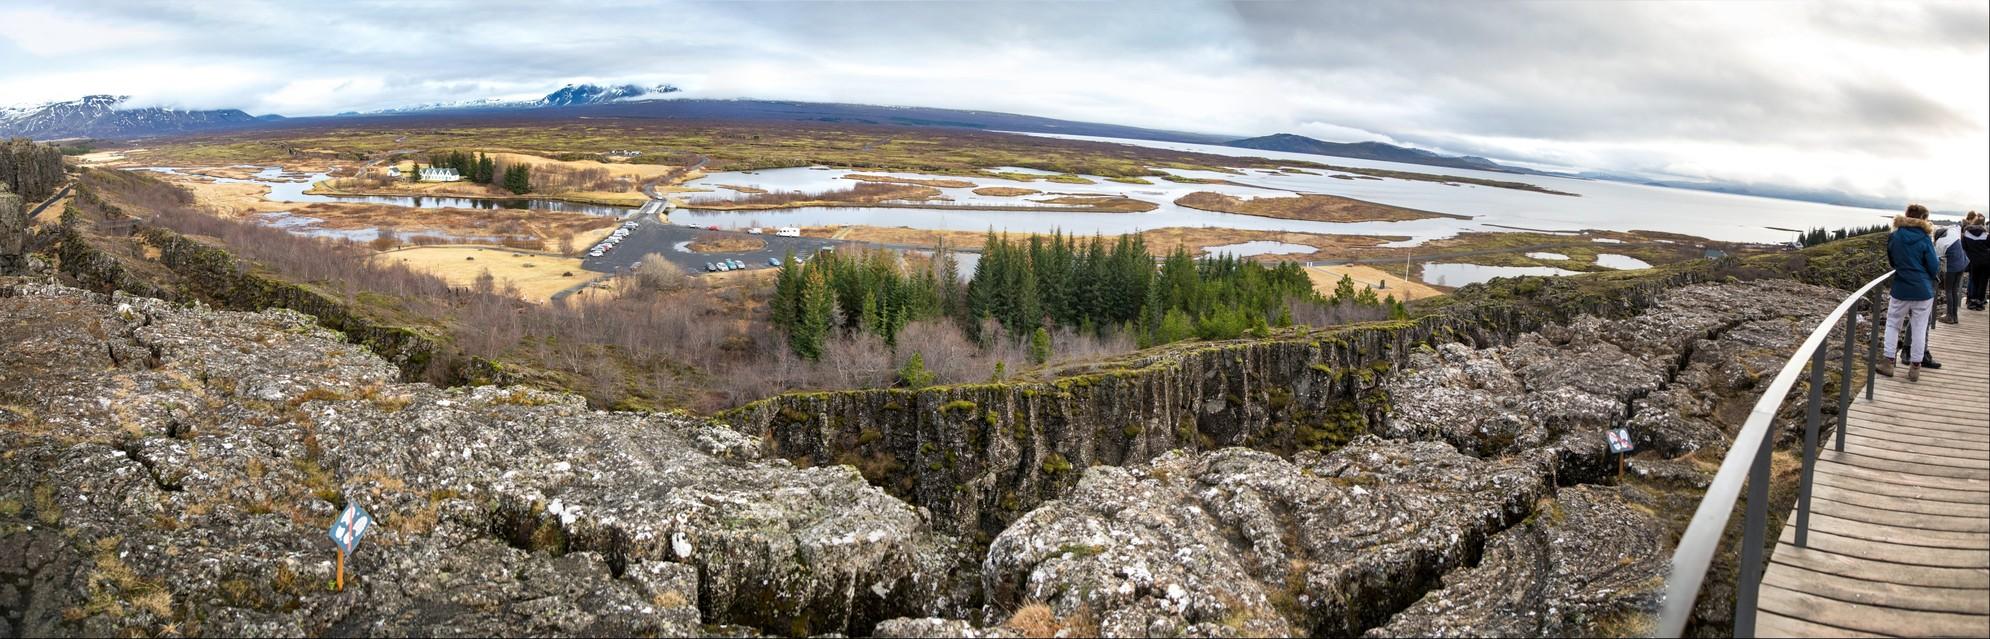 Iceland - Feb 2017 - Panorama 19